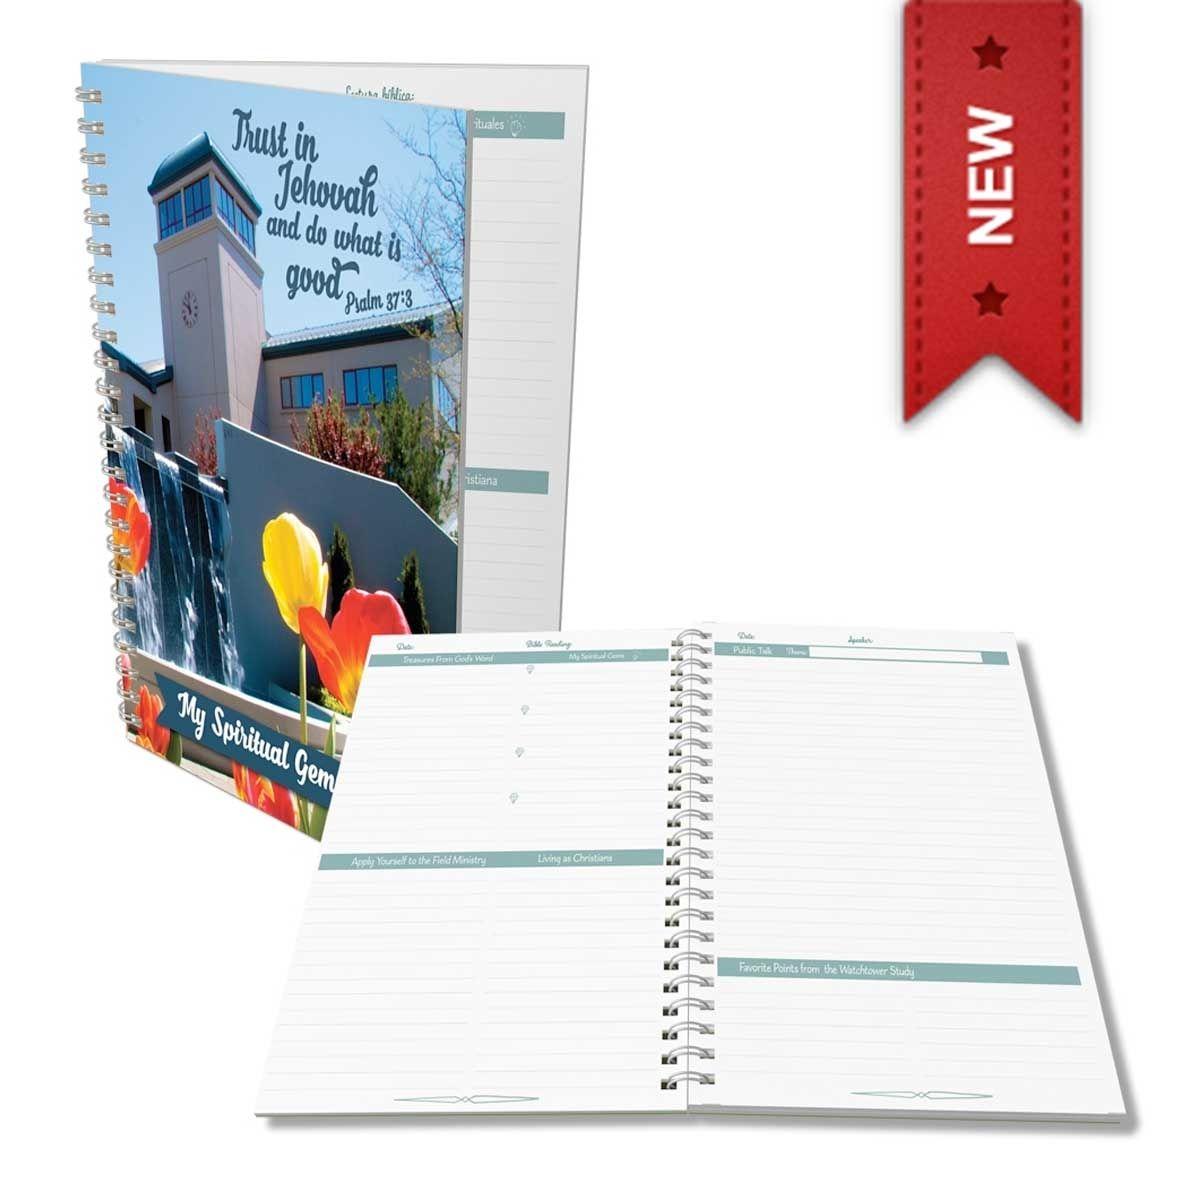 My Spiritual Gems Meeting Workbook Companion With Jw Yeartext